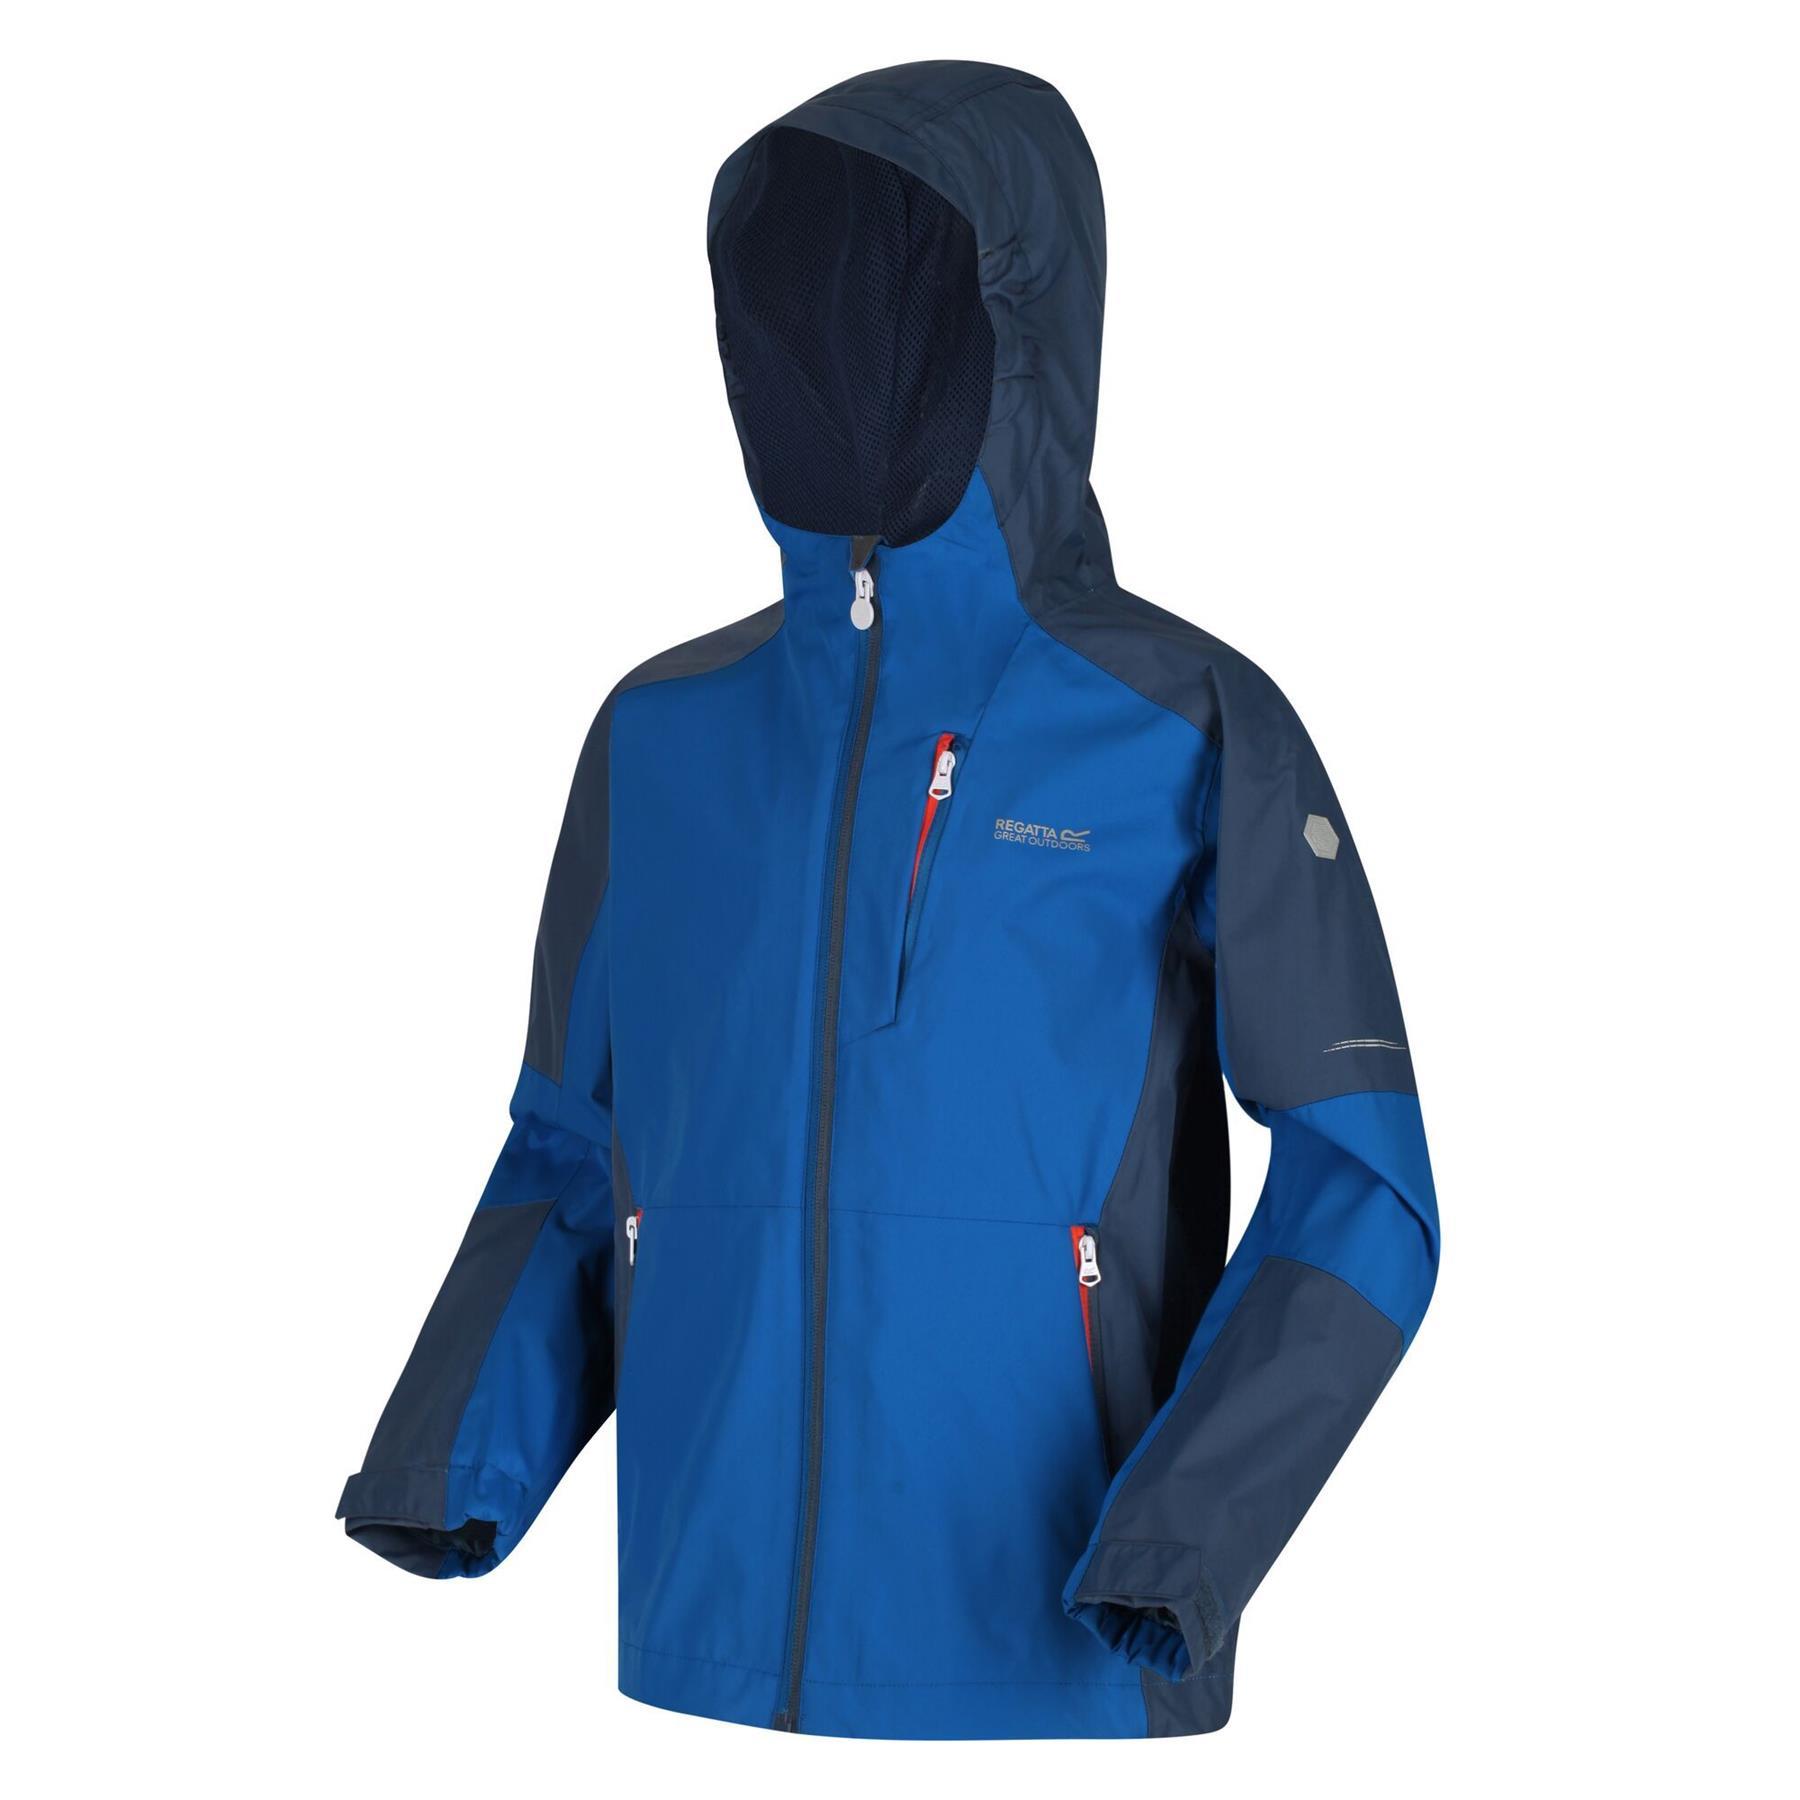 miniatuur 3 - Regatta Kids Calderdale II Waterproof Hooded Zip Pocket Jacket Boy Girls Coat